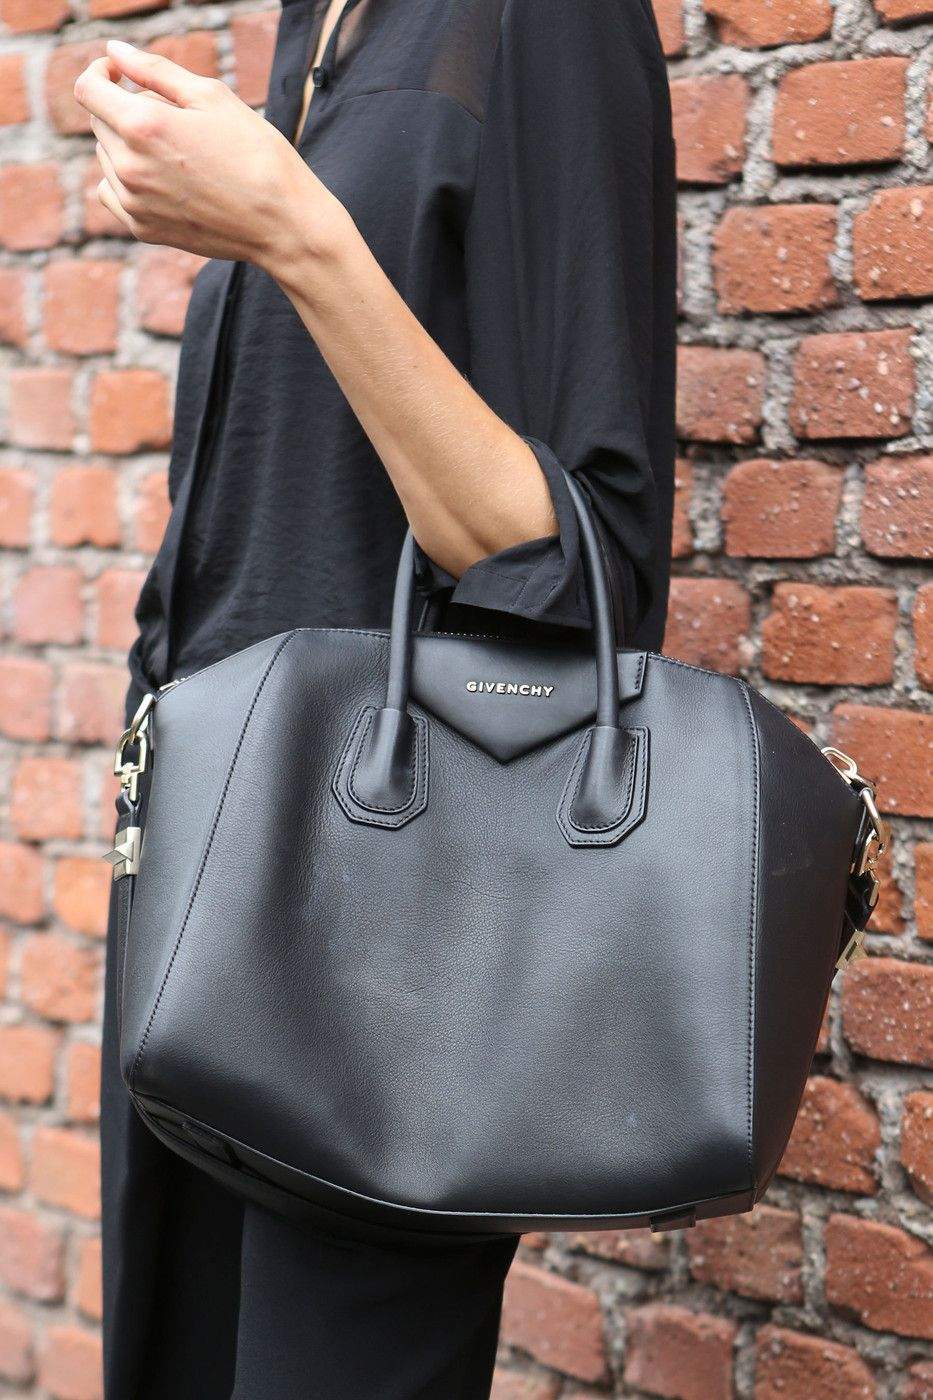 342b66a50ac5 Givenchy Antigona - is this the handbag our generation